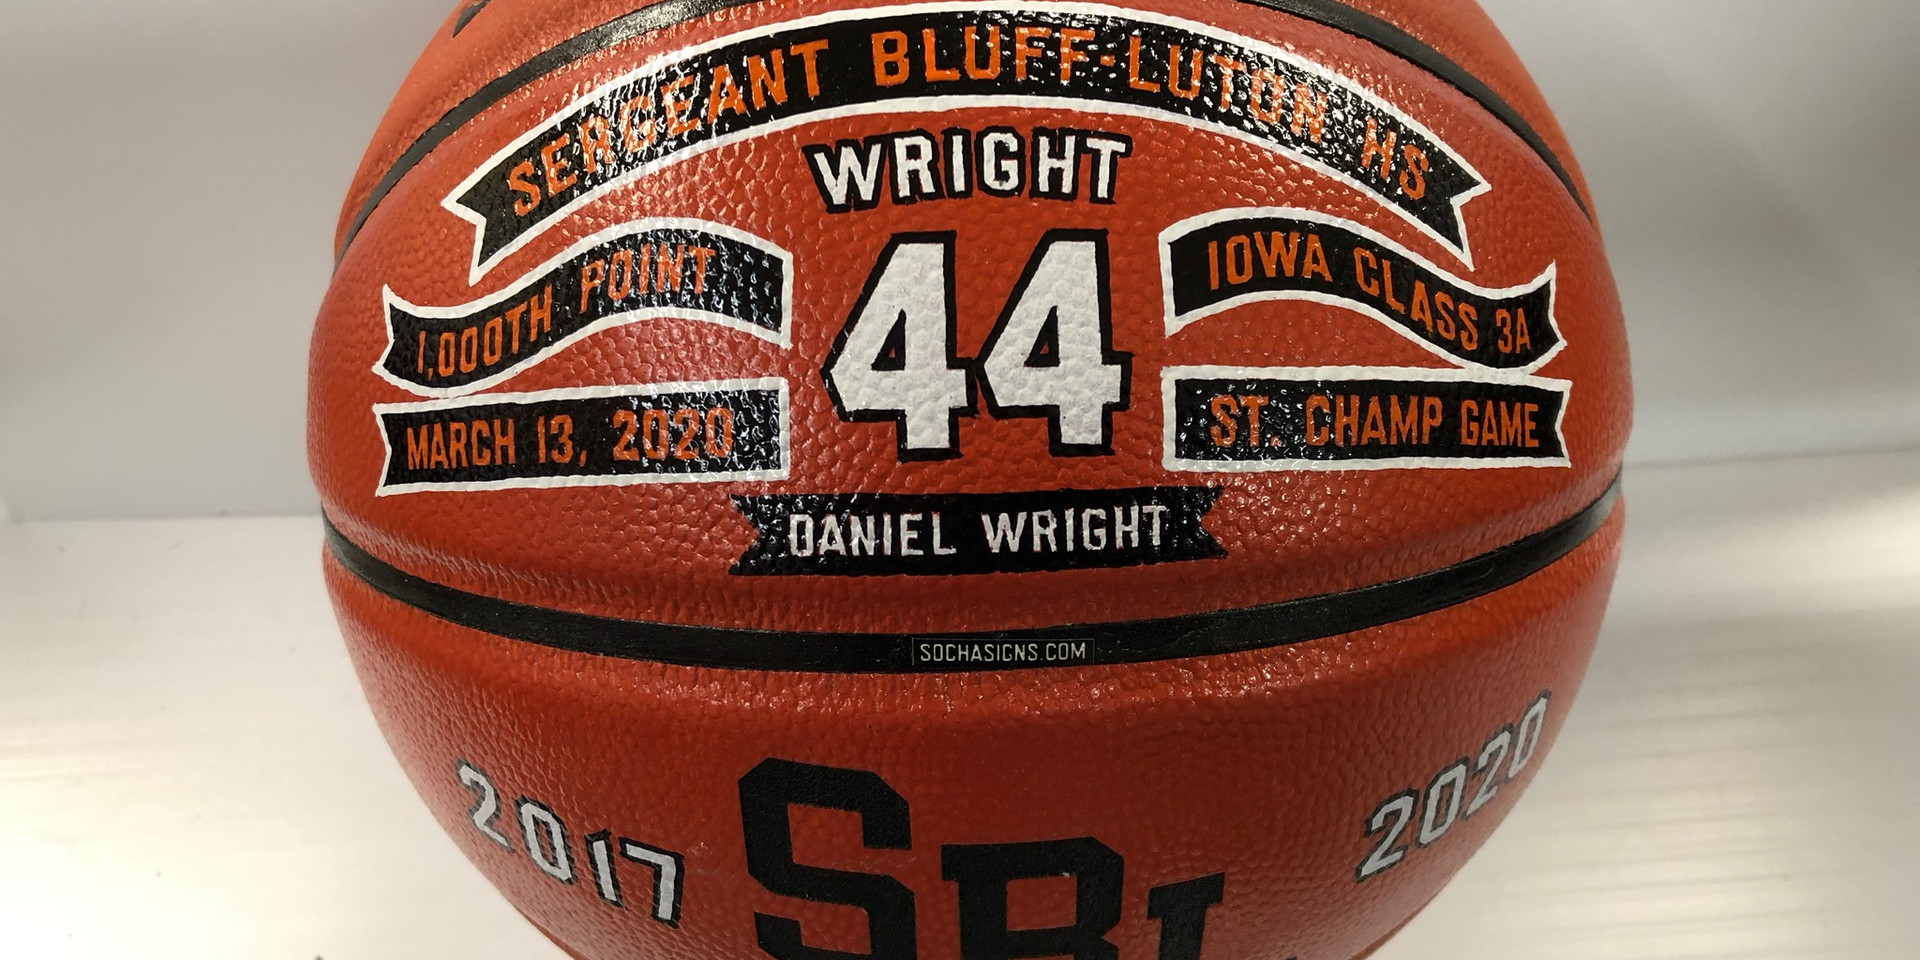 Personalized Basketballs